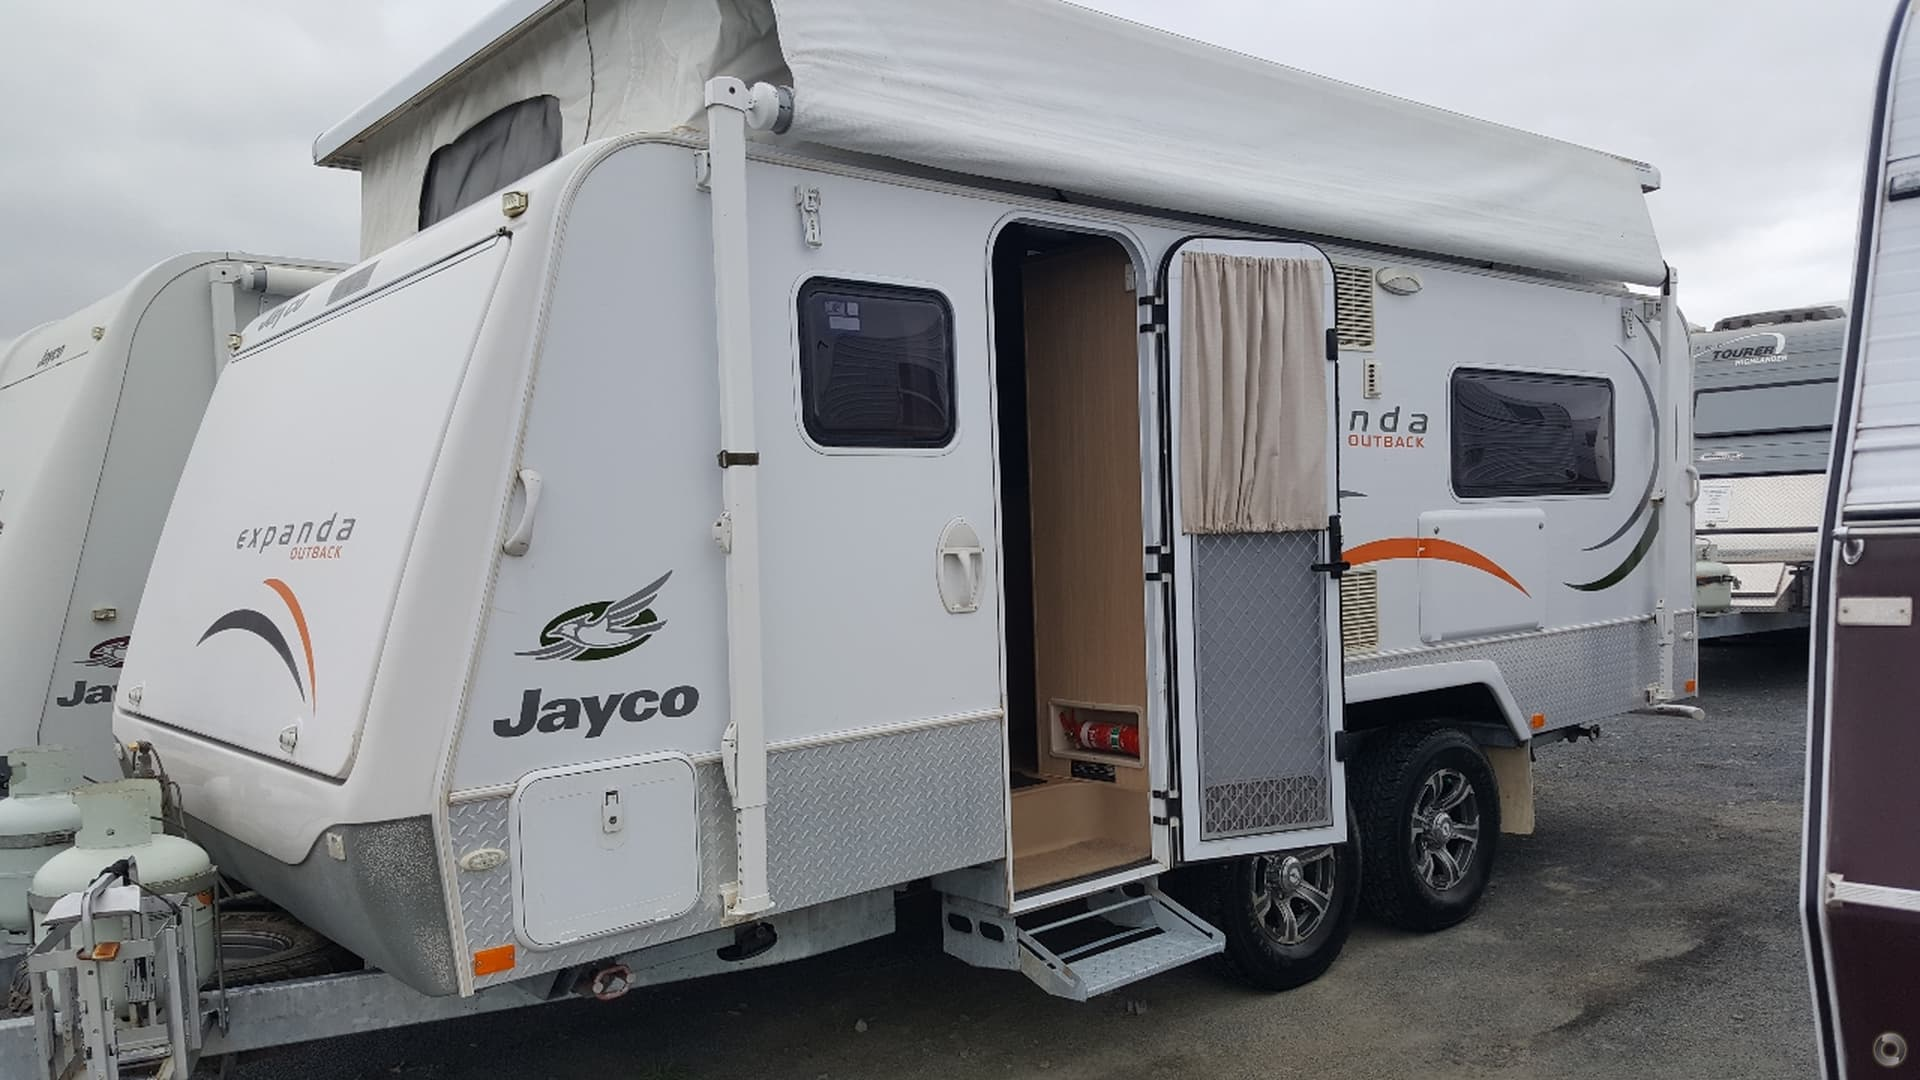 2012 Jayco Expanda Outback